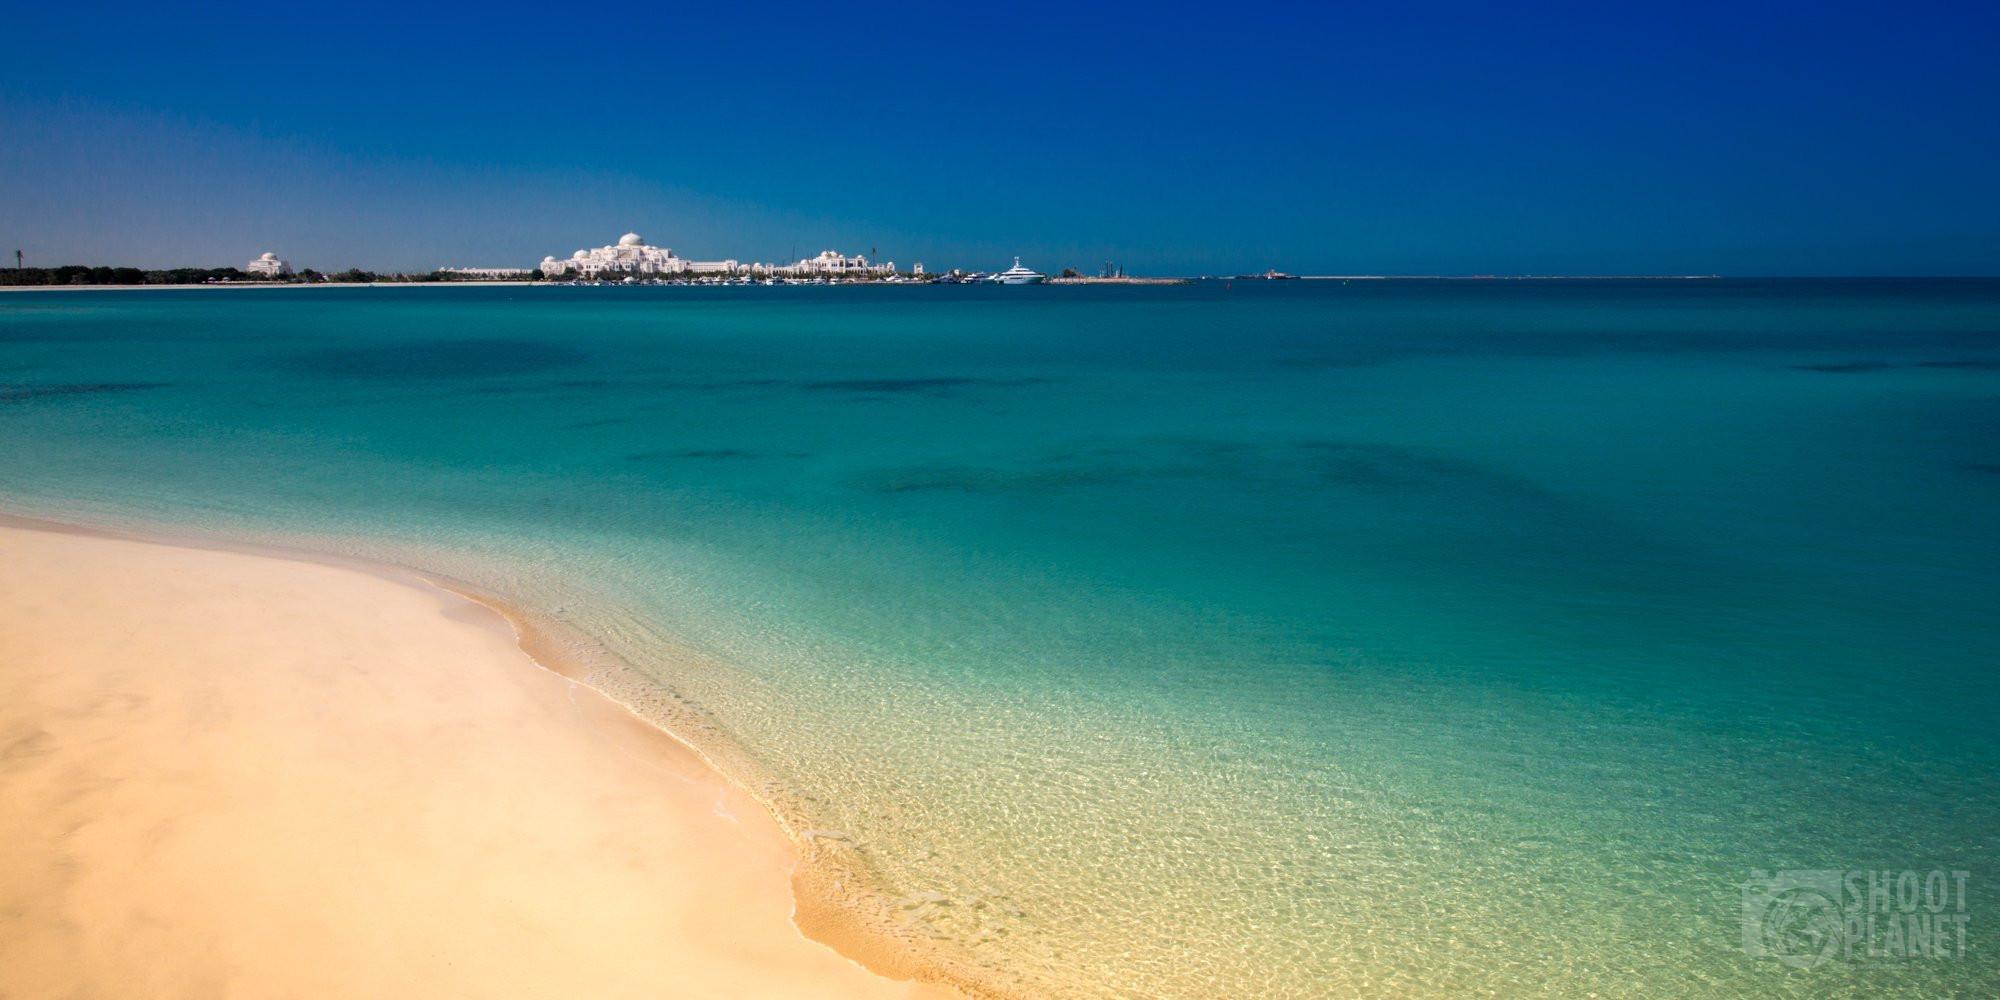 White sand beach, Persian Sea, Abu Dhabi